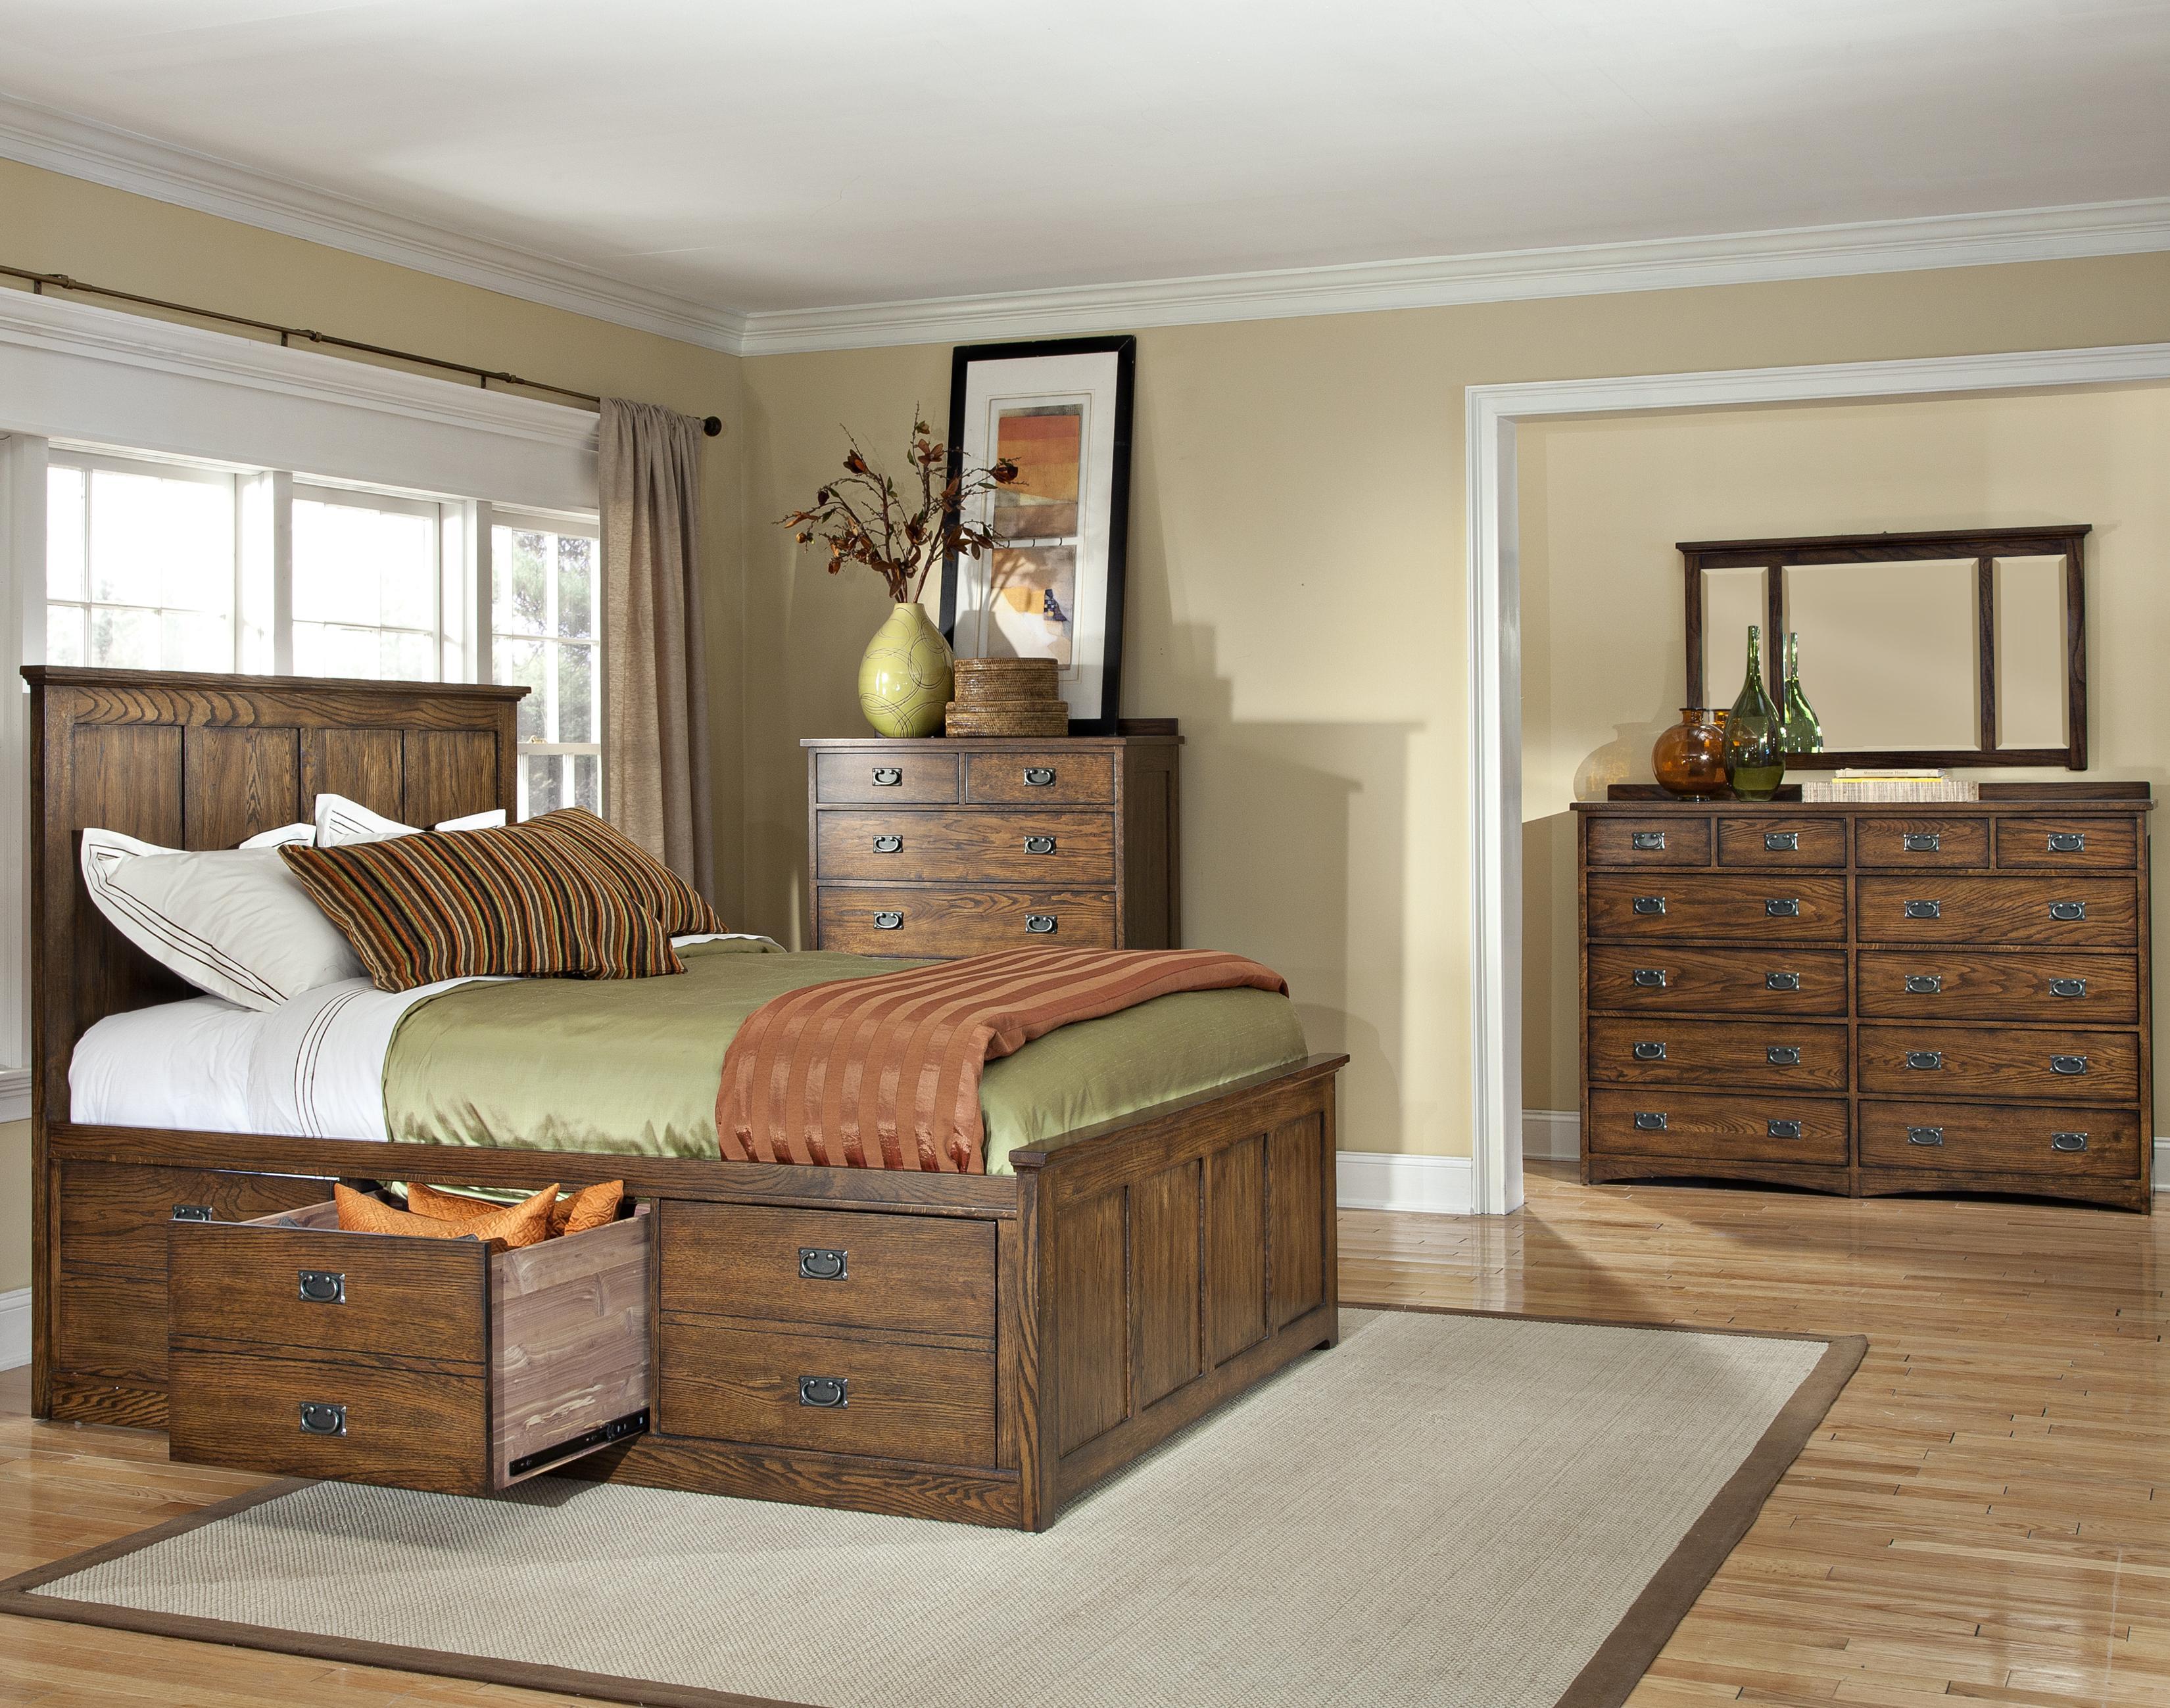 Bed Also High End Bedroom Sets 2 Bedroom Homes In New Jersey Bedroom